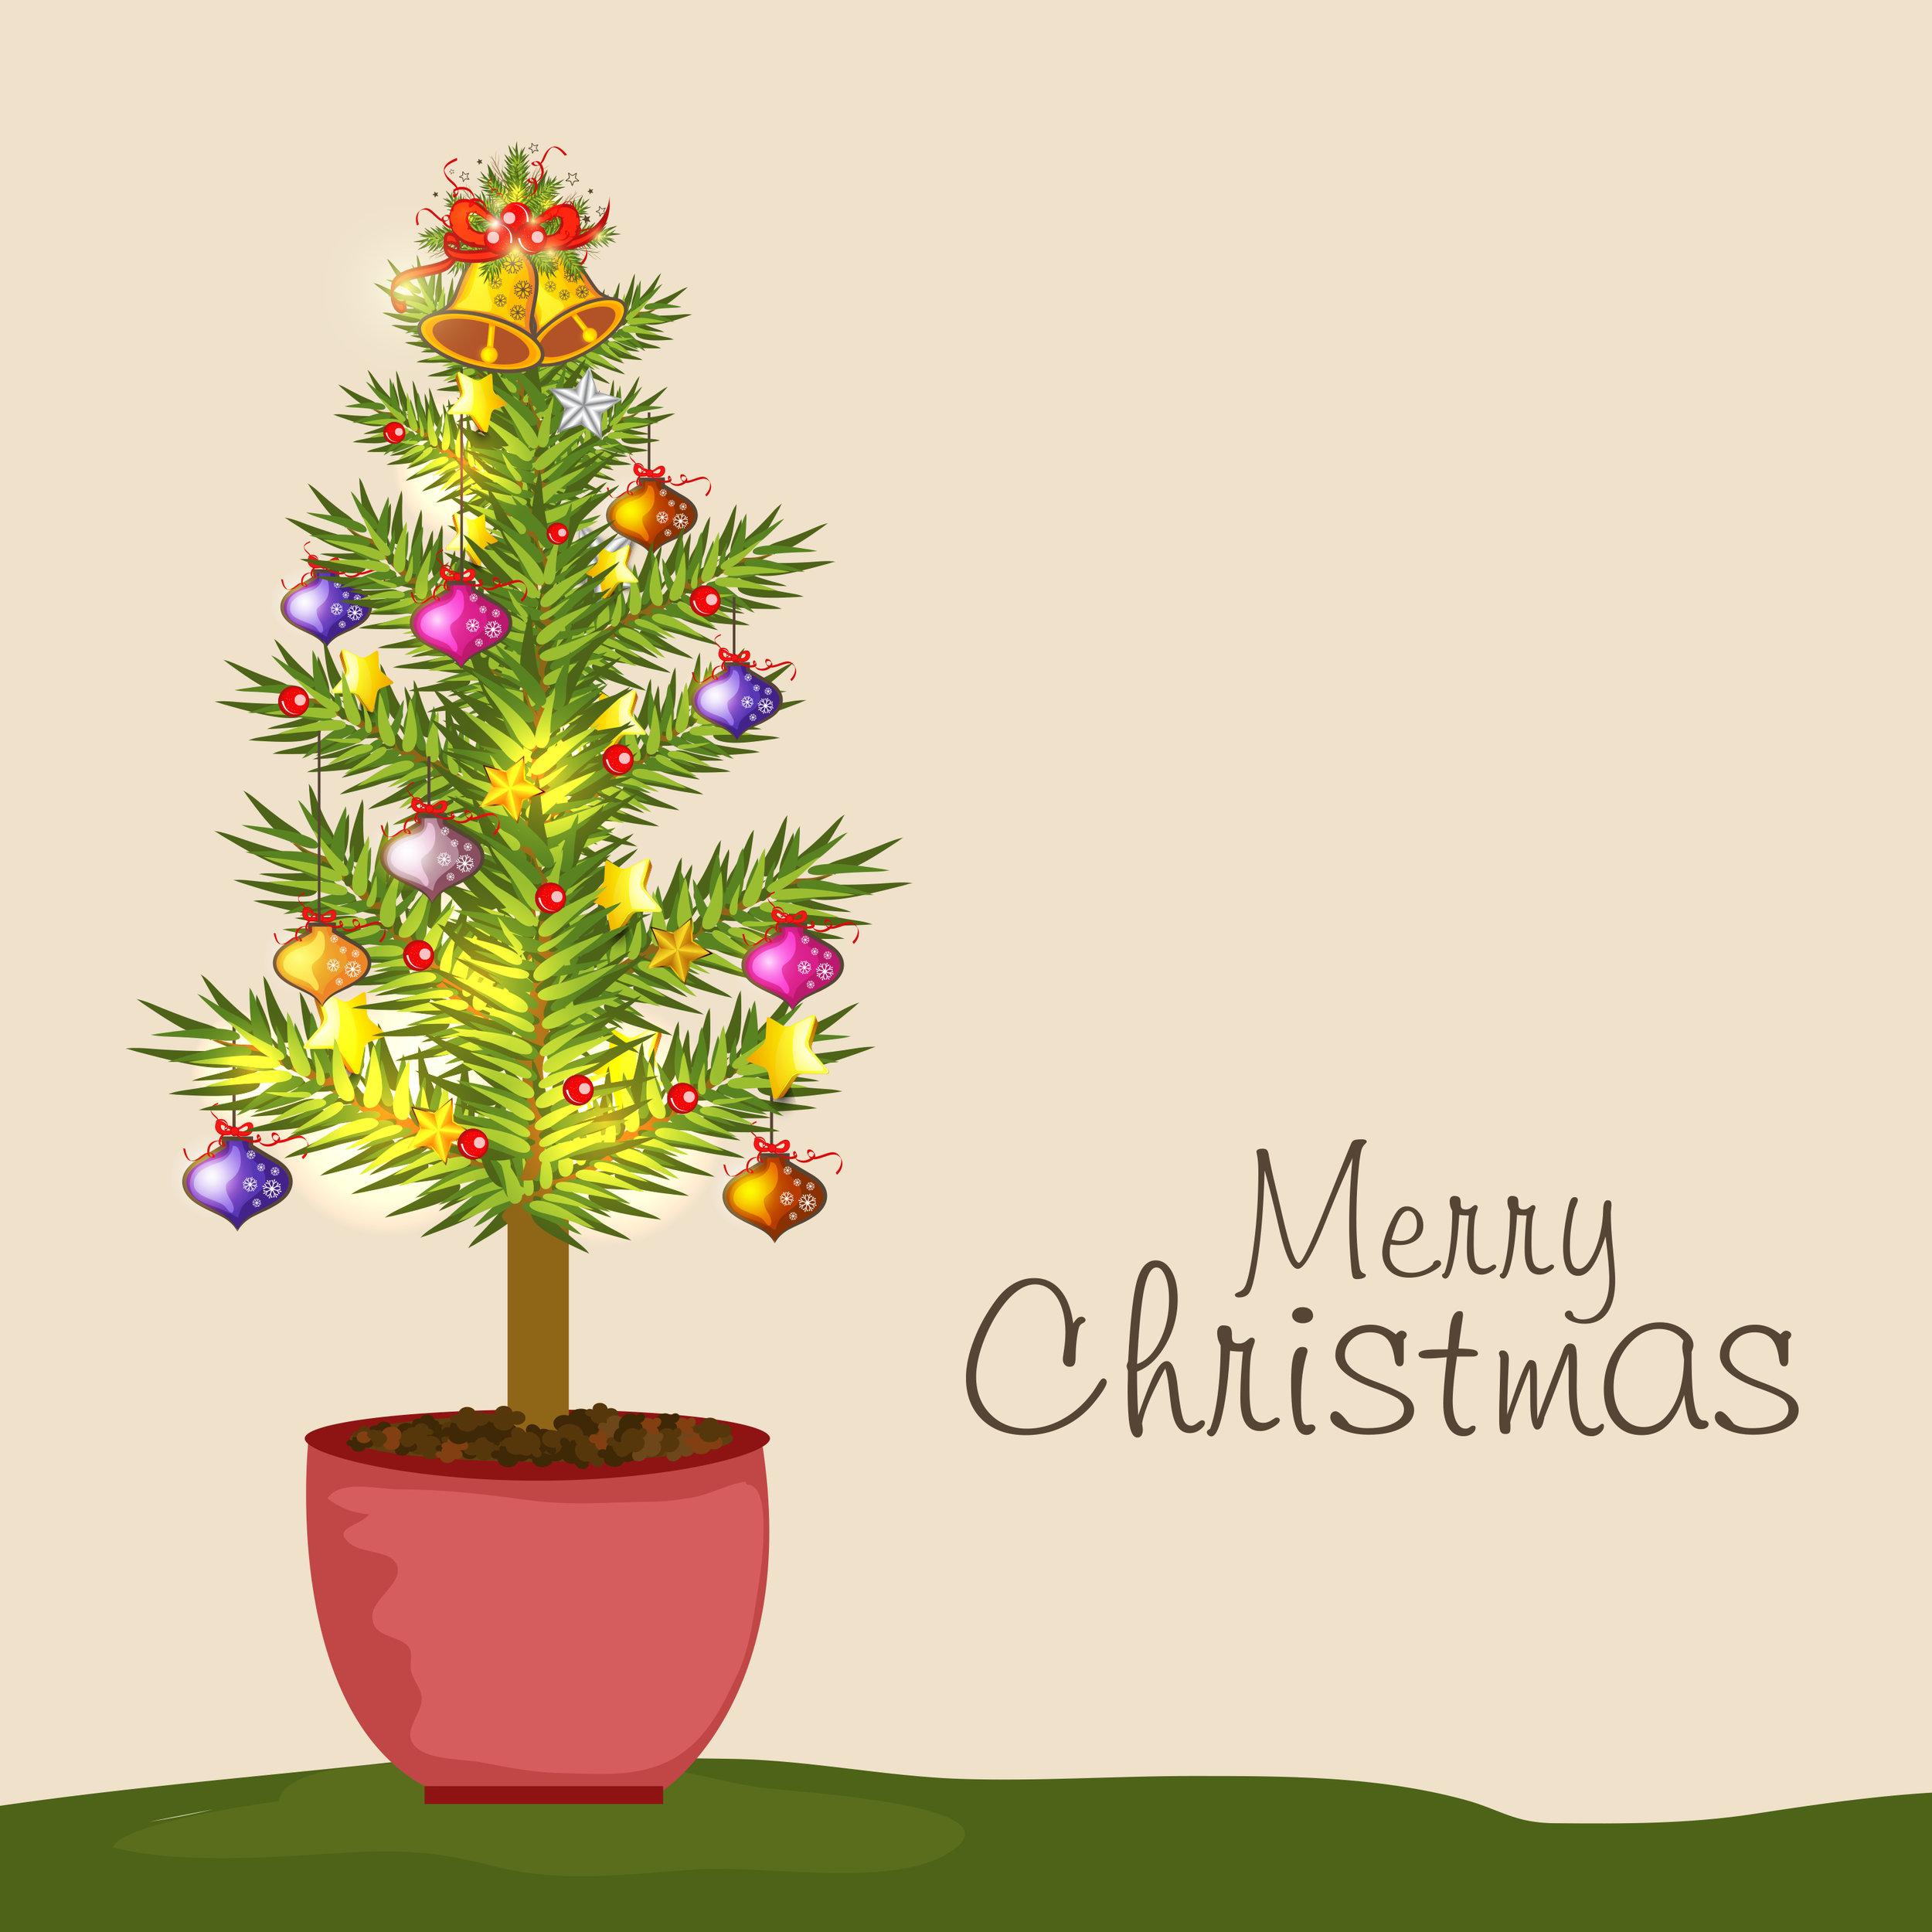 Christmas_110053655-1115-allint-1_L.jpg